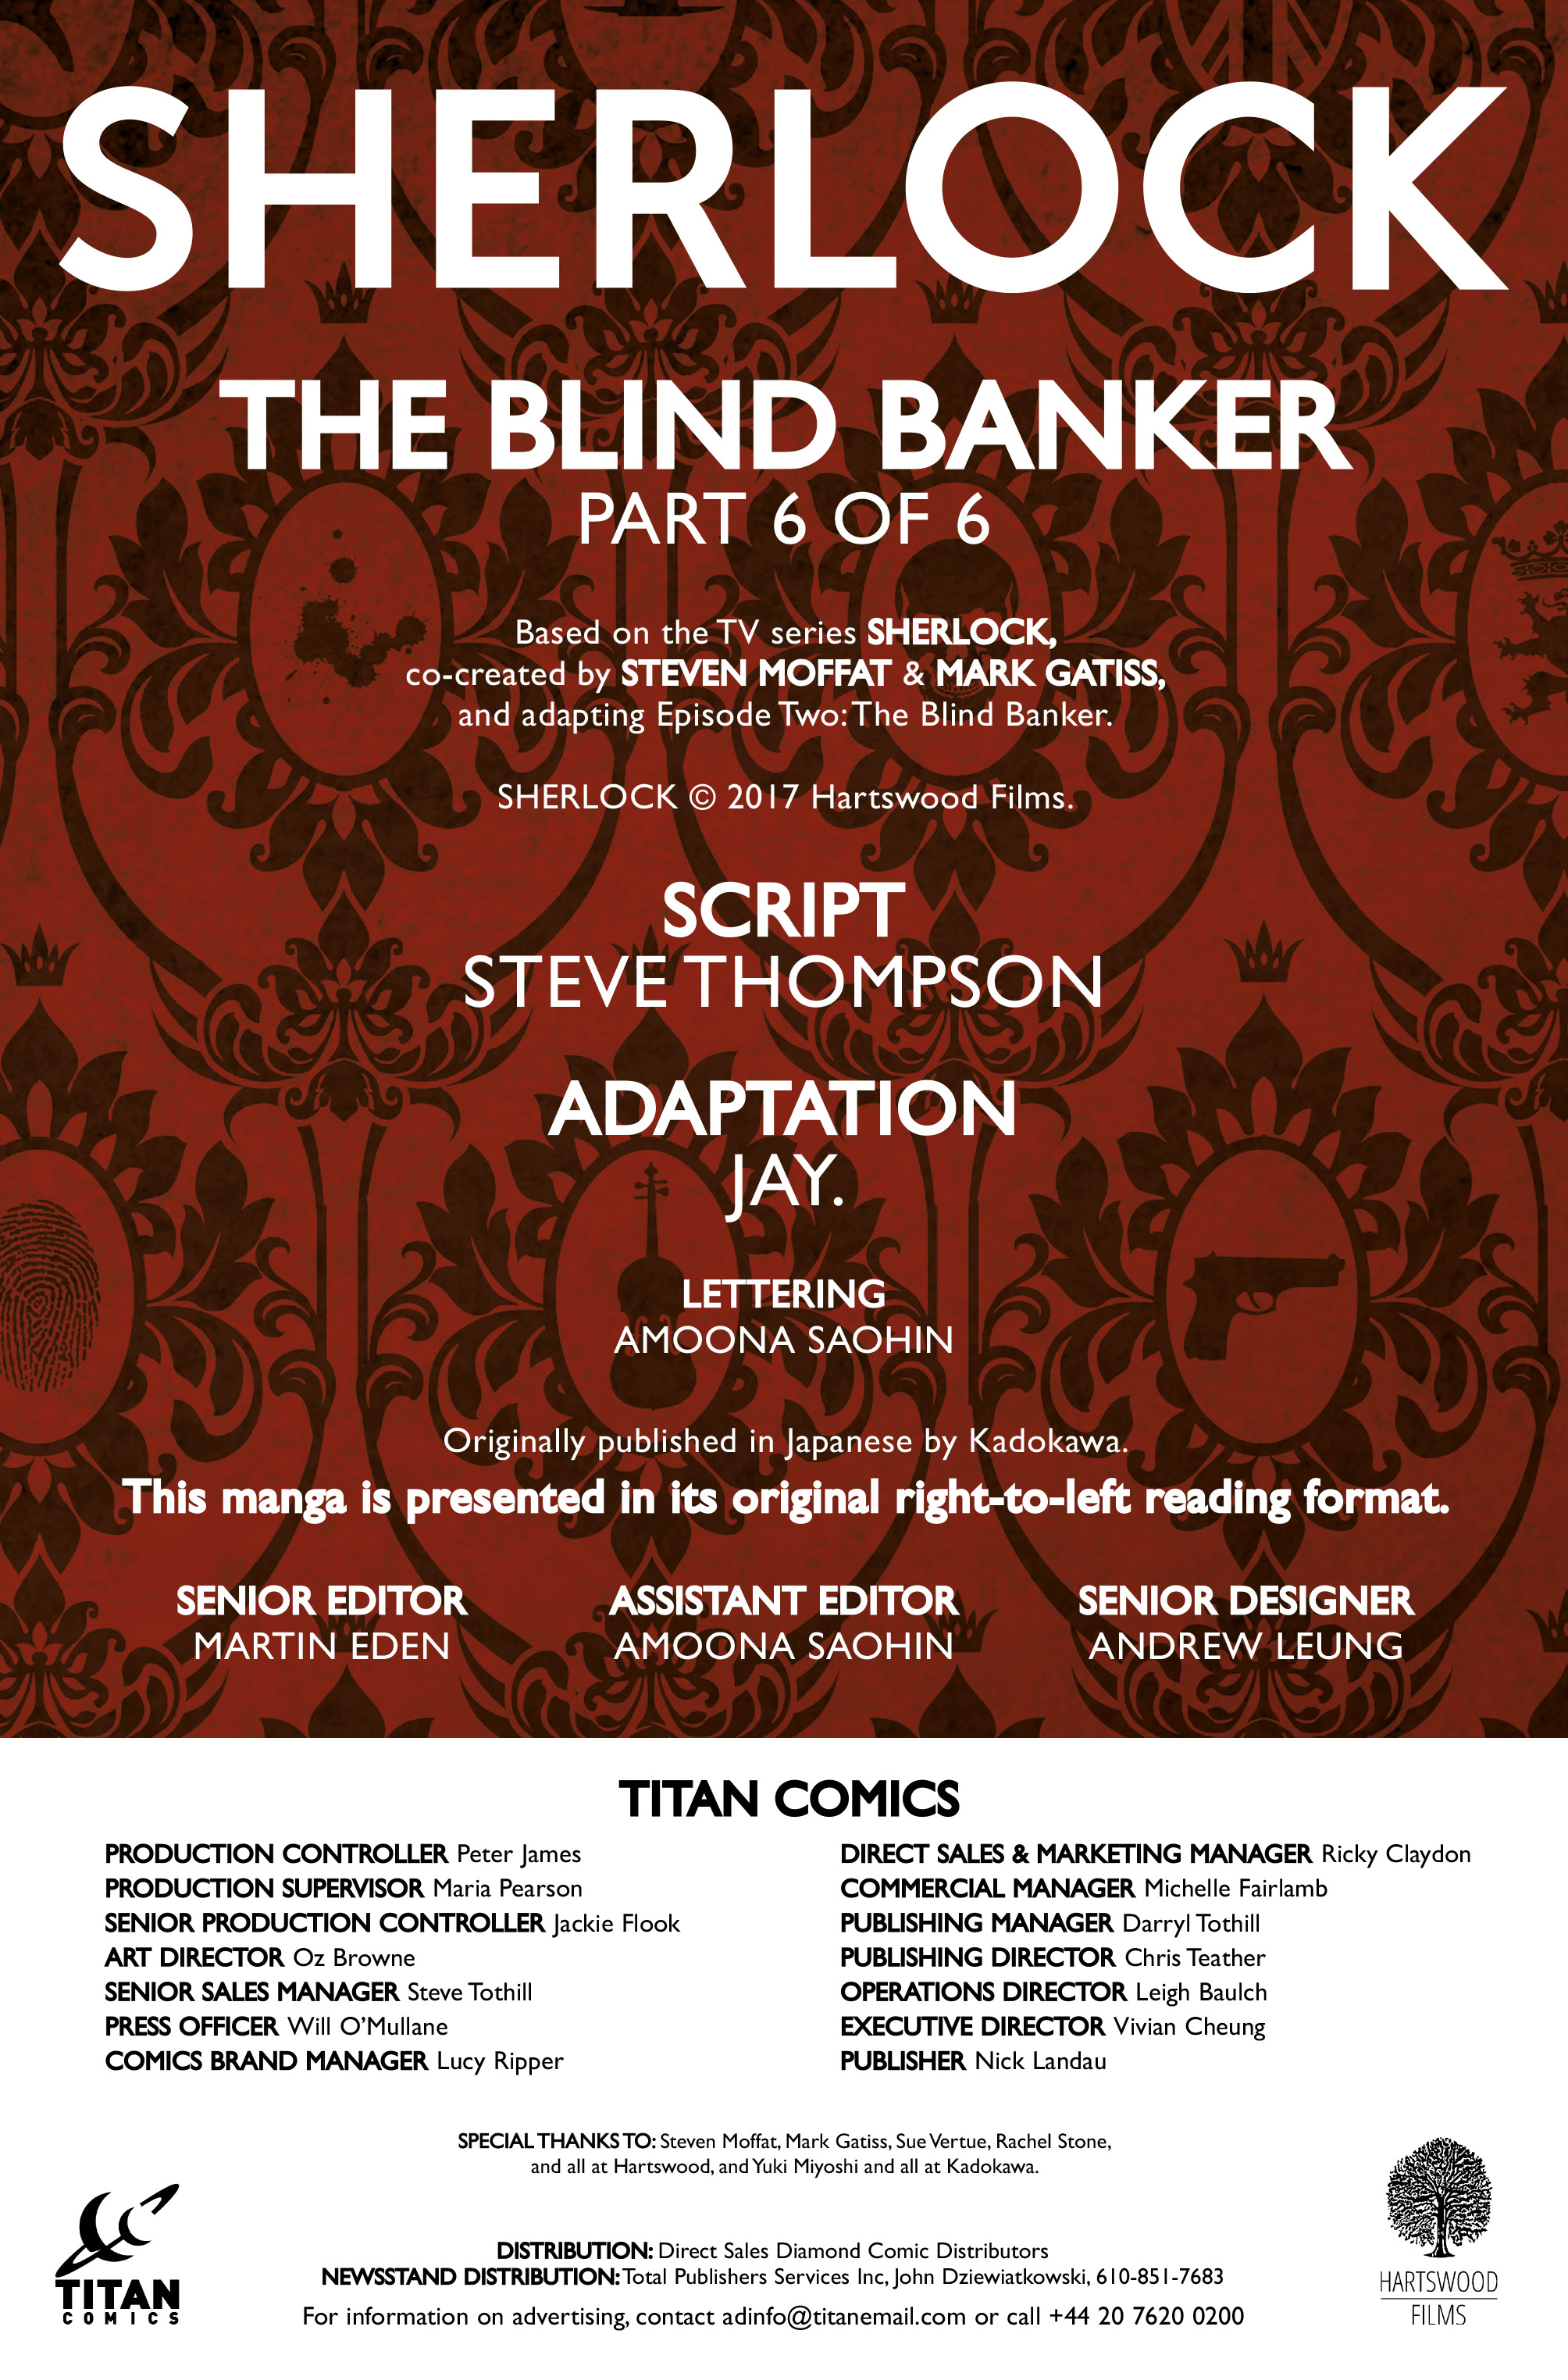 Read online Sherlock: The Blind Banker comic -  Issue #6 - 4